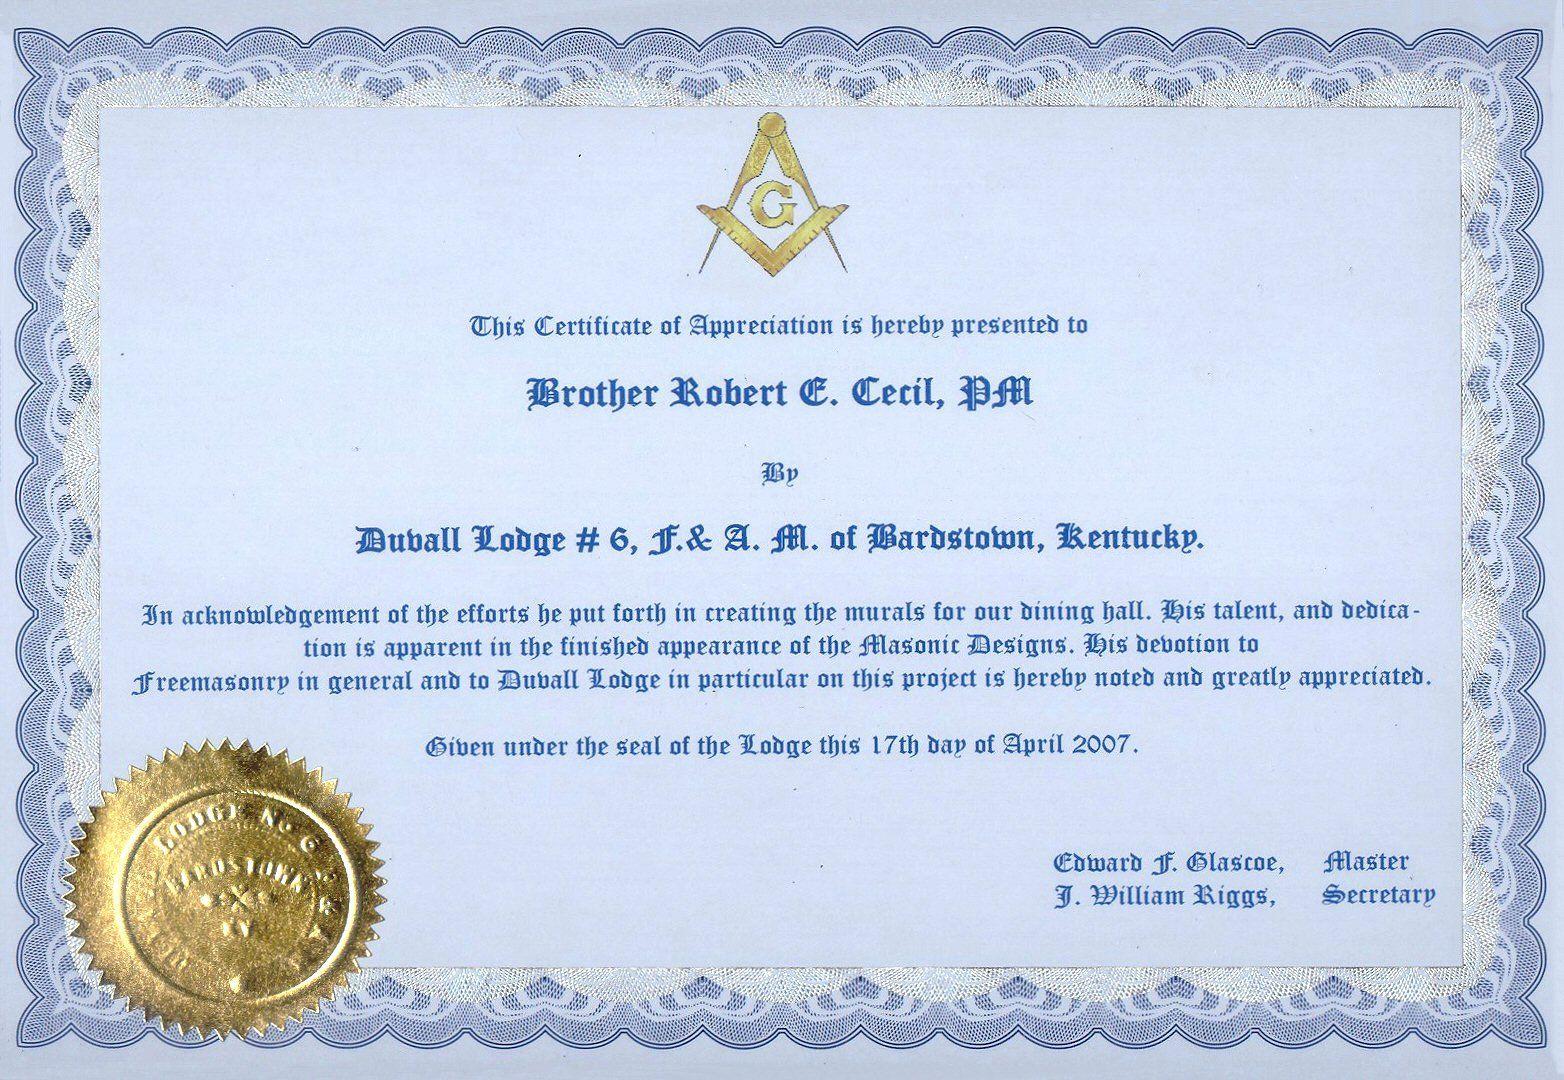 Masonic Certificate Of Appreciation Fresh Masonic Certificate Templa Certificate Of Appreciation Certificate Of Recognition Template Certificate Templates Free